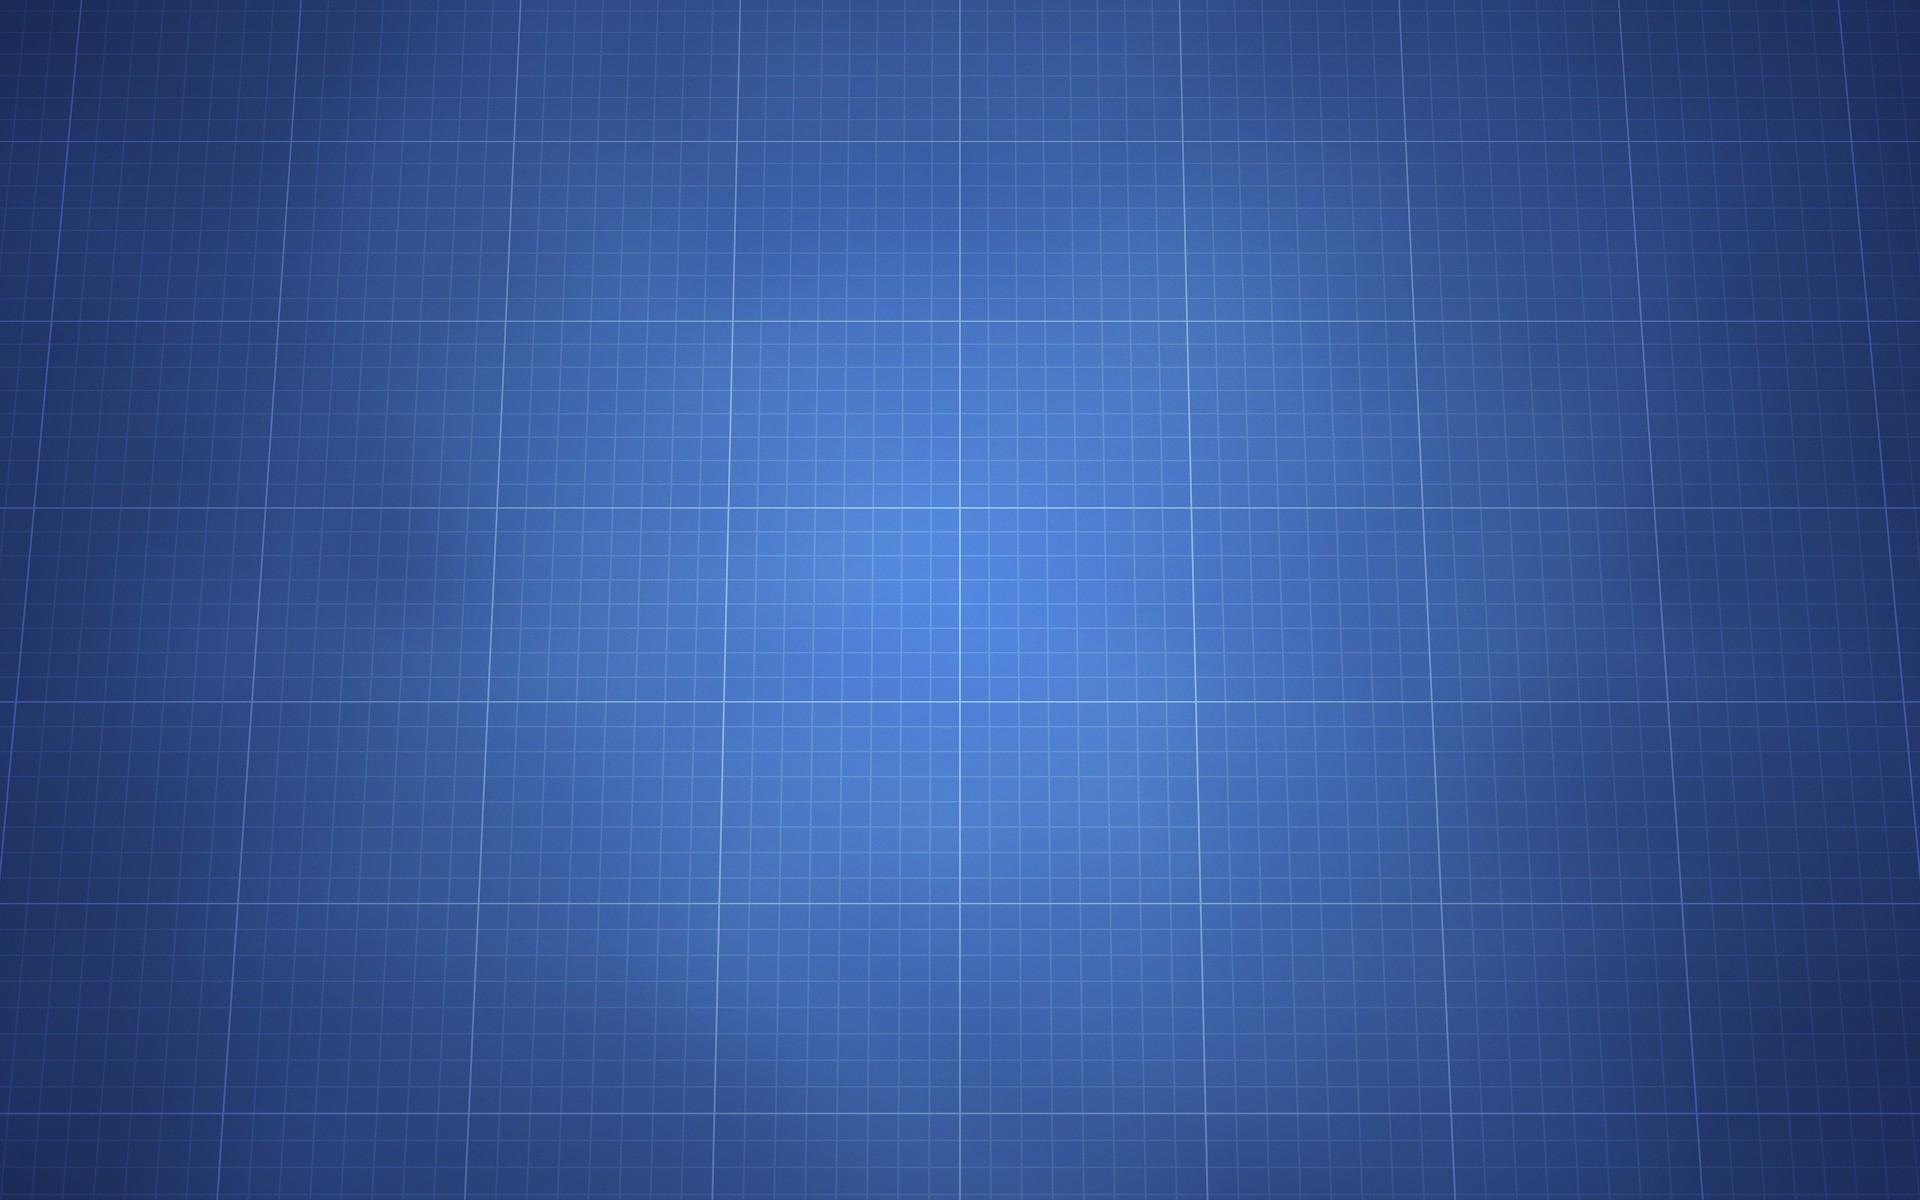 blue grid wallpaper 22609